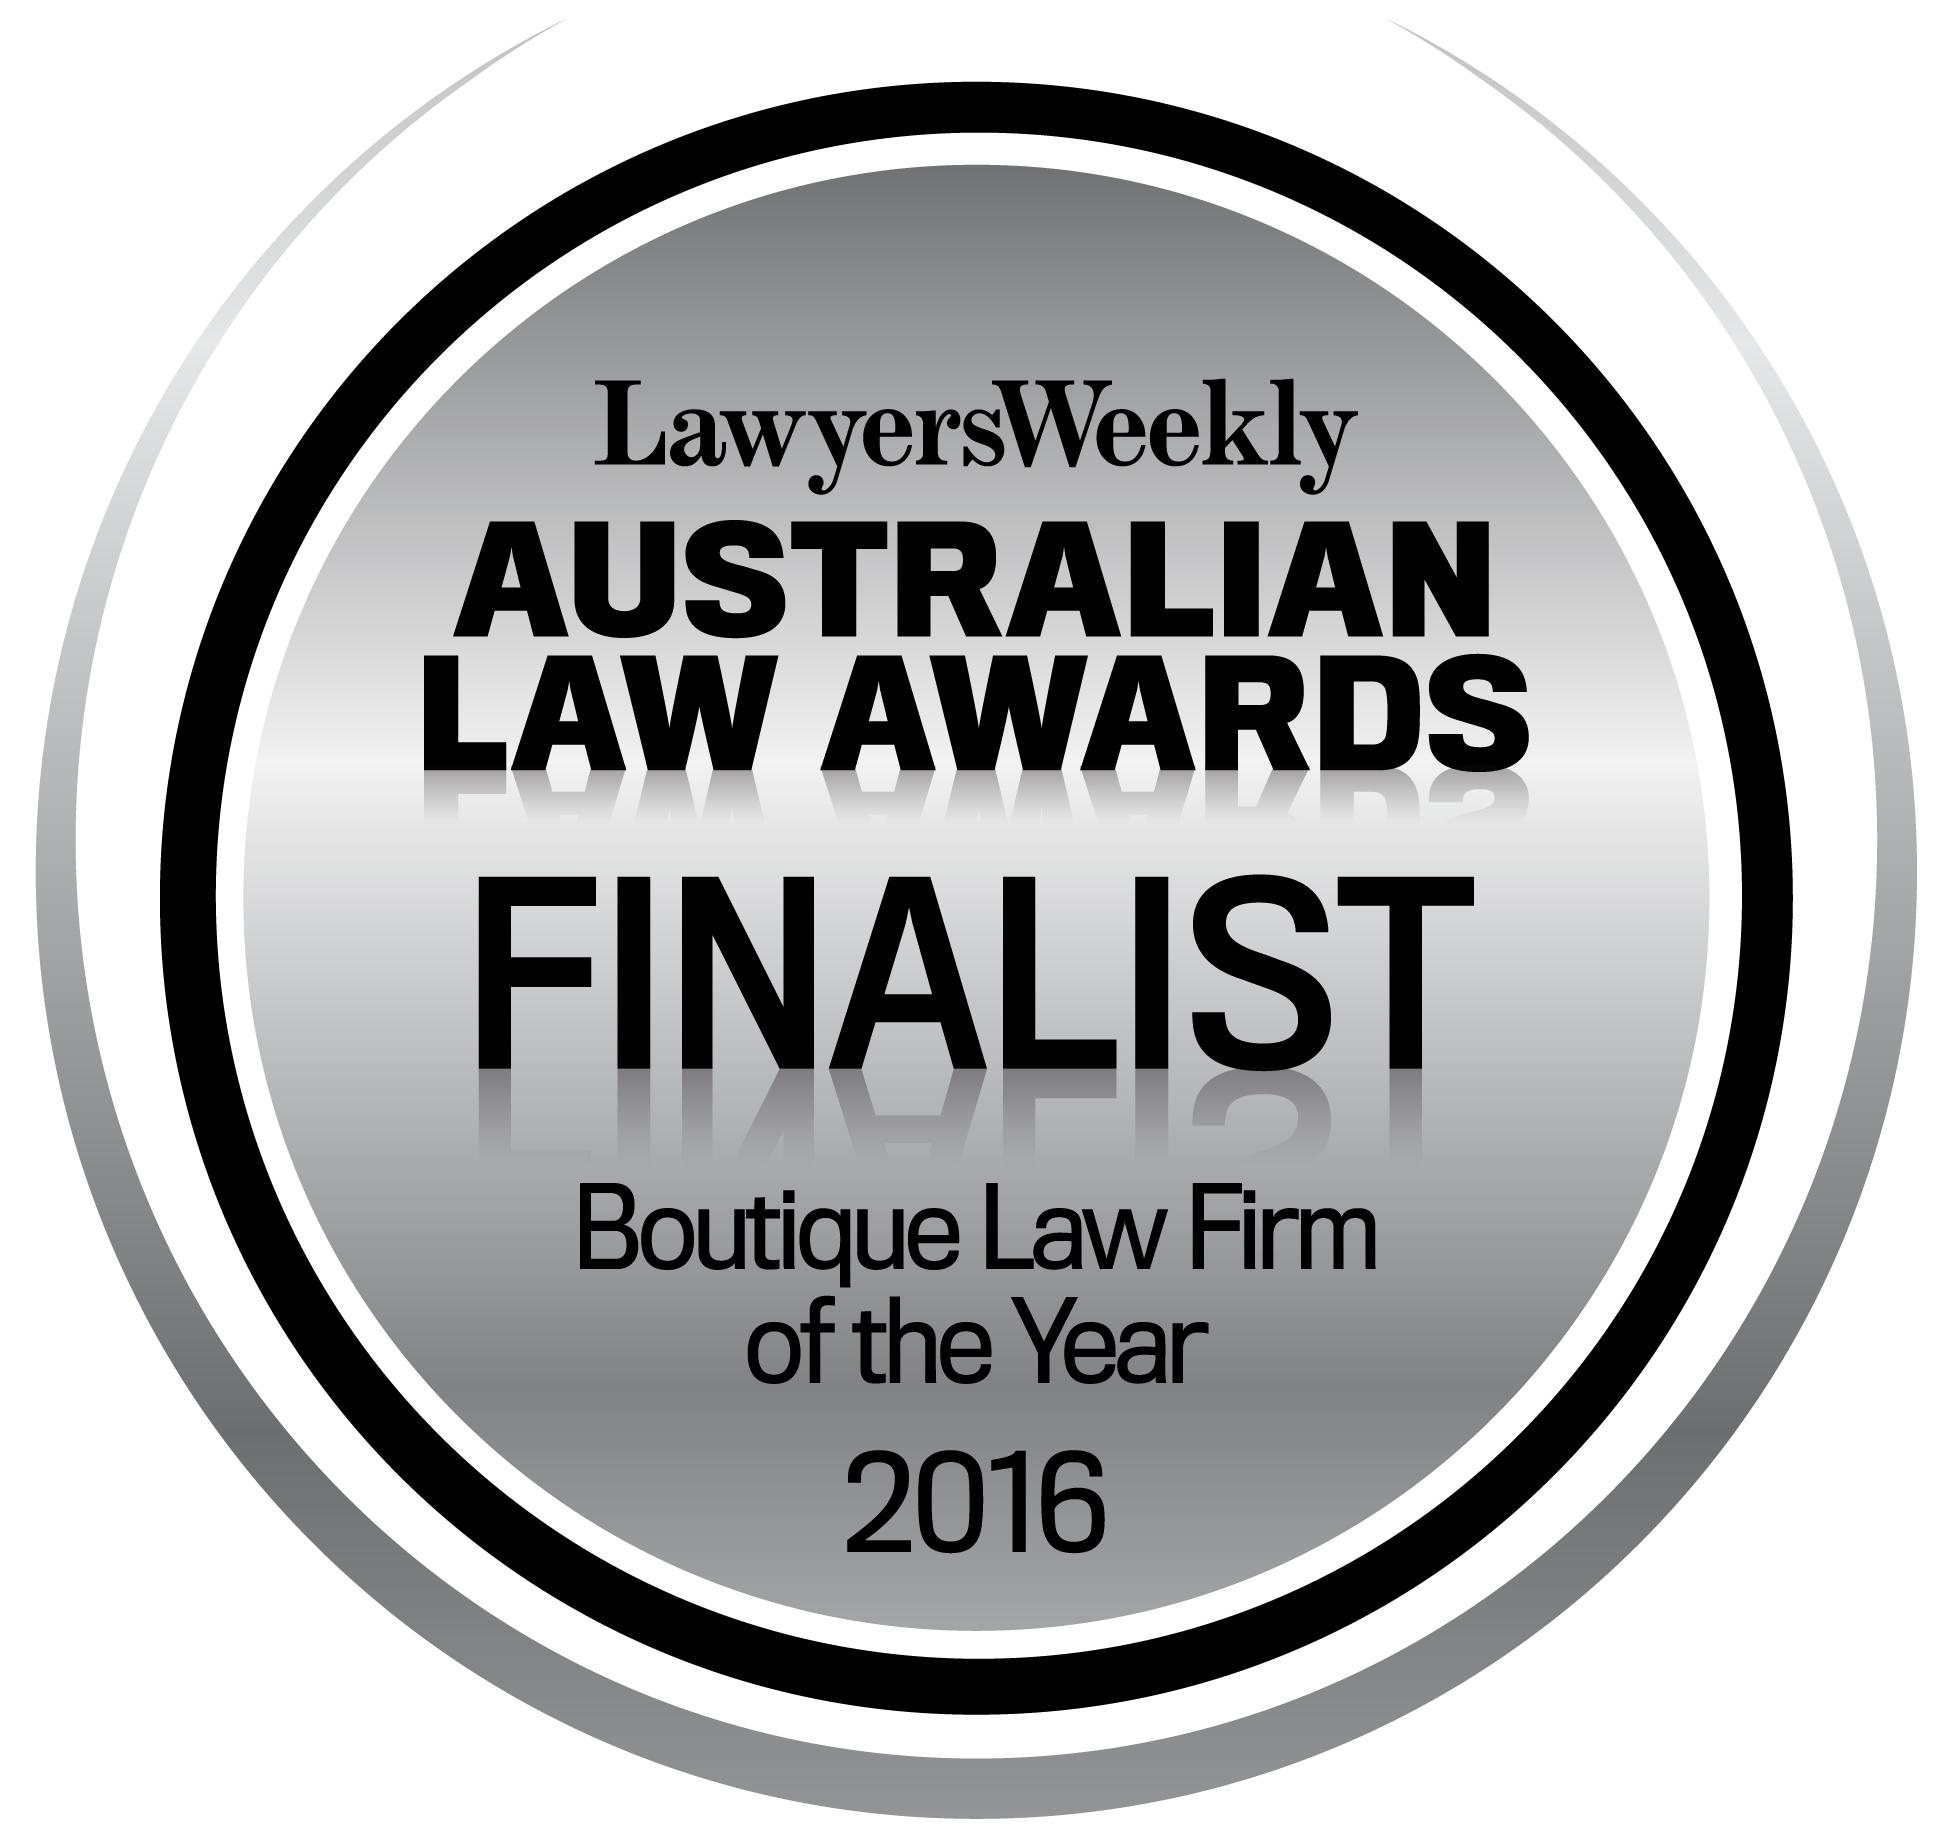 Thynne + Macartney Recognised as Trailblazers in 2016 Australian Law Awards